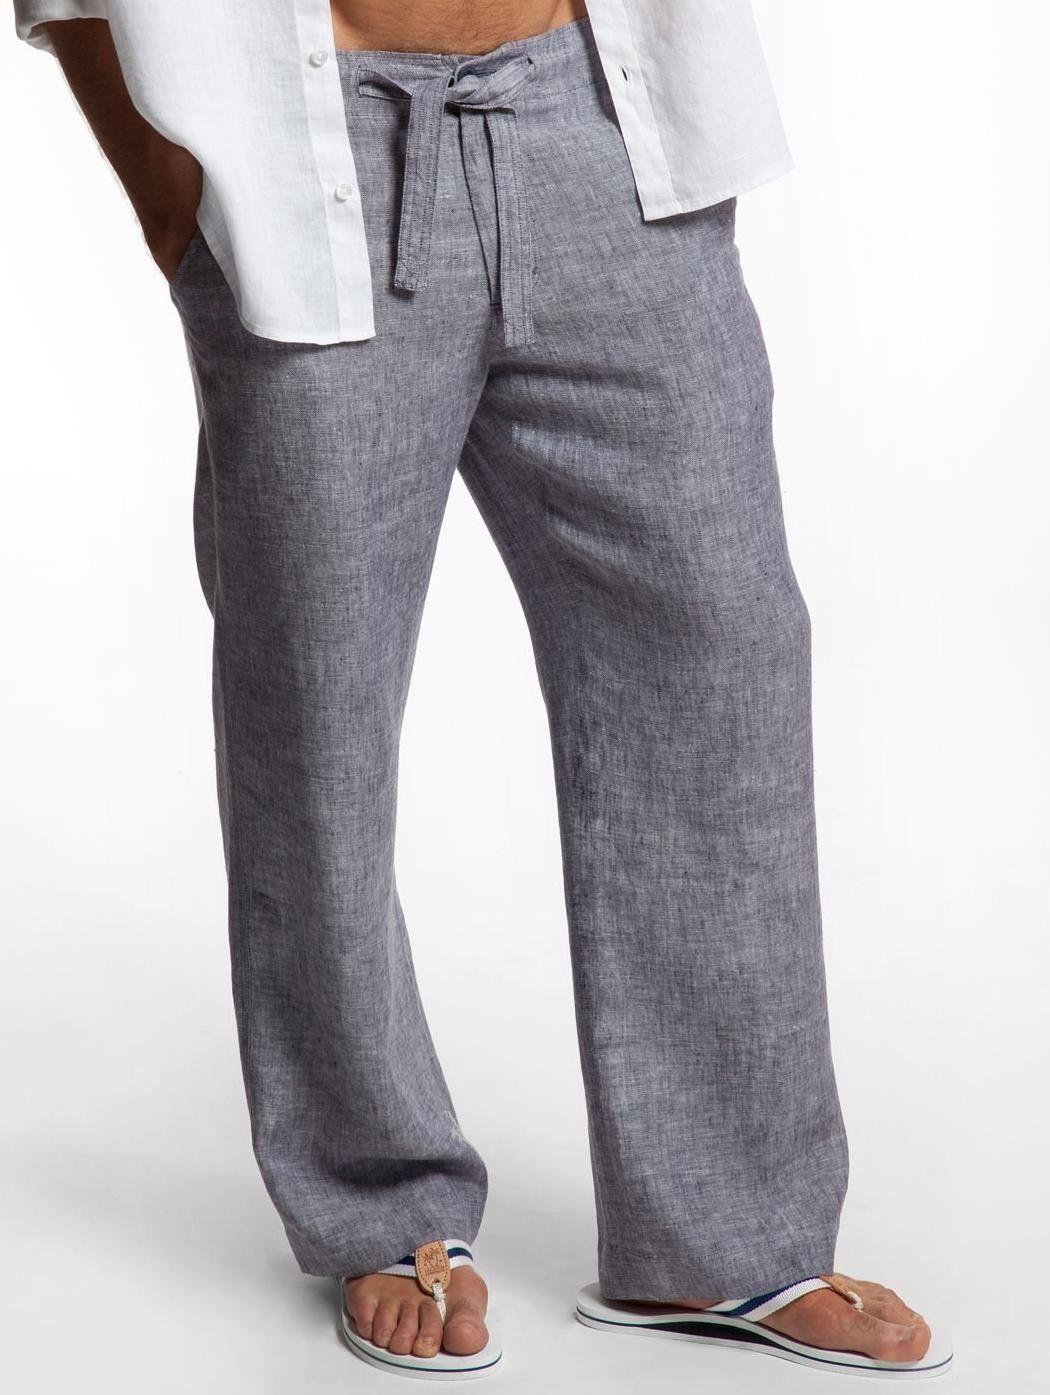 7985cda51e Storm Beachcomber Linen Pants - Linen Pants for Men | Island Company ...